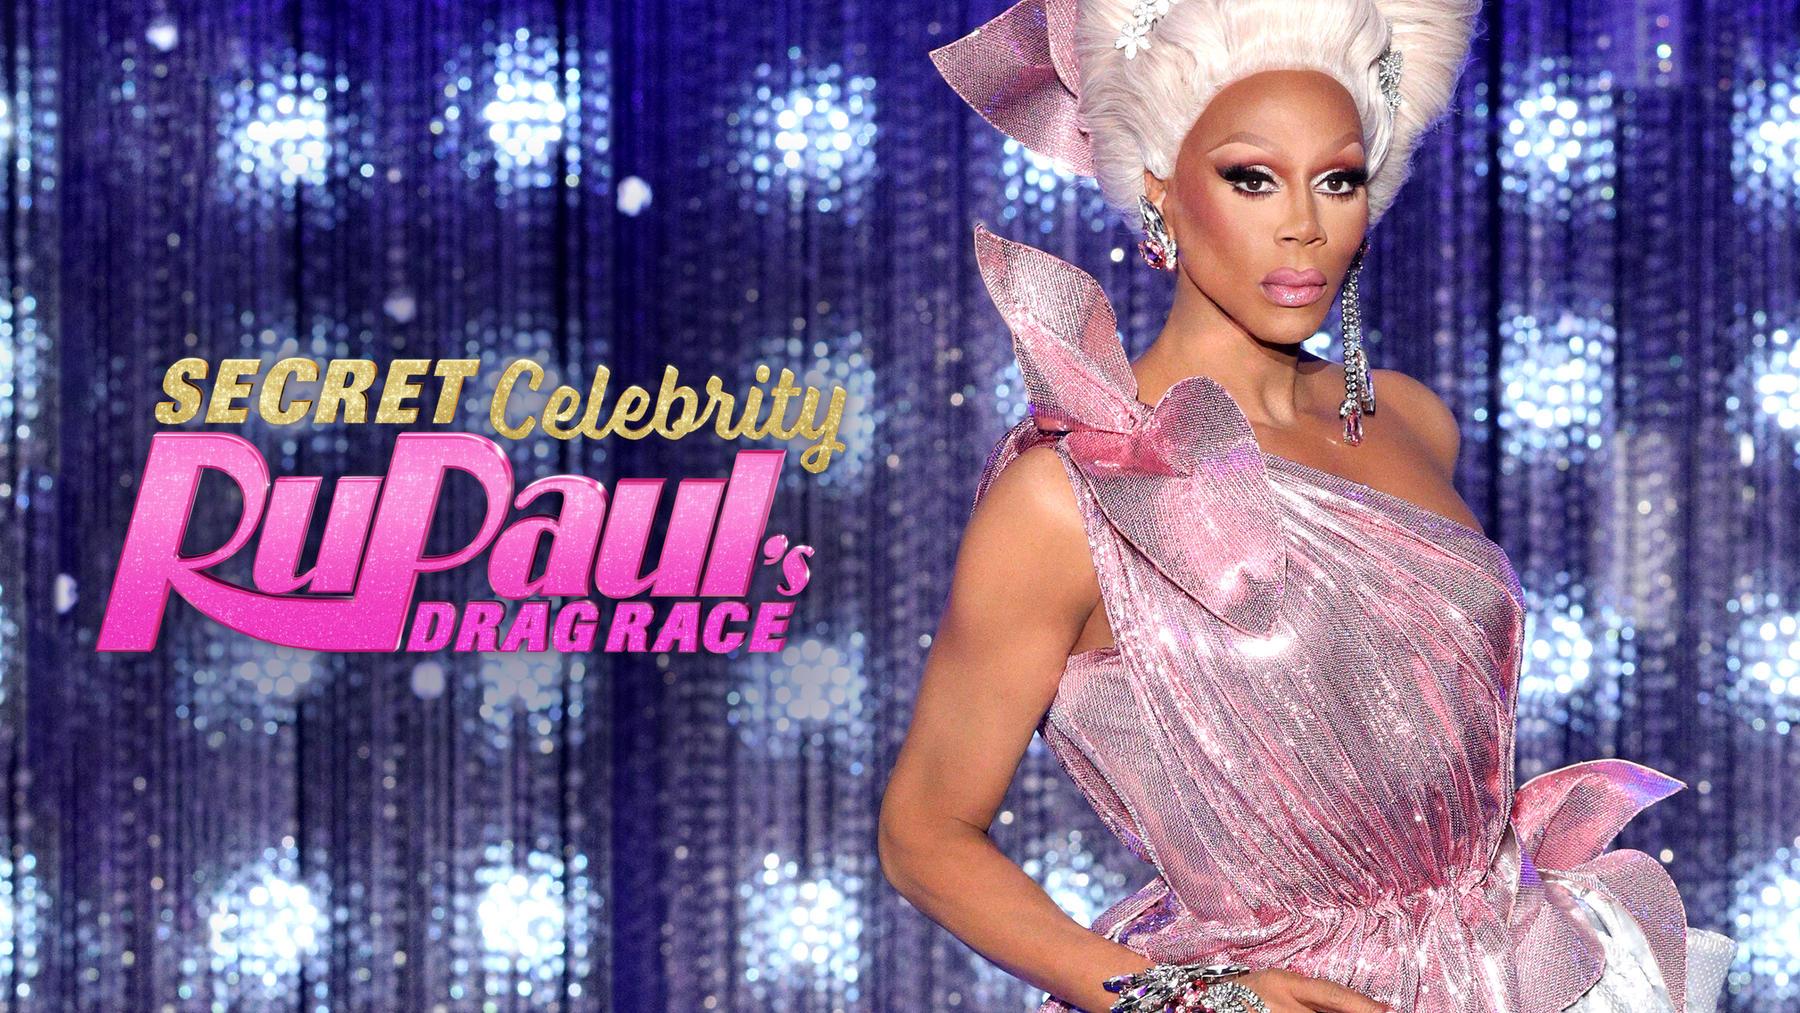 RuPaul's Celebrity Drag Race